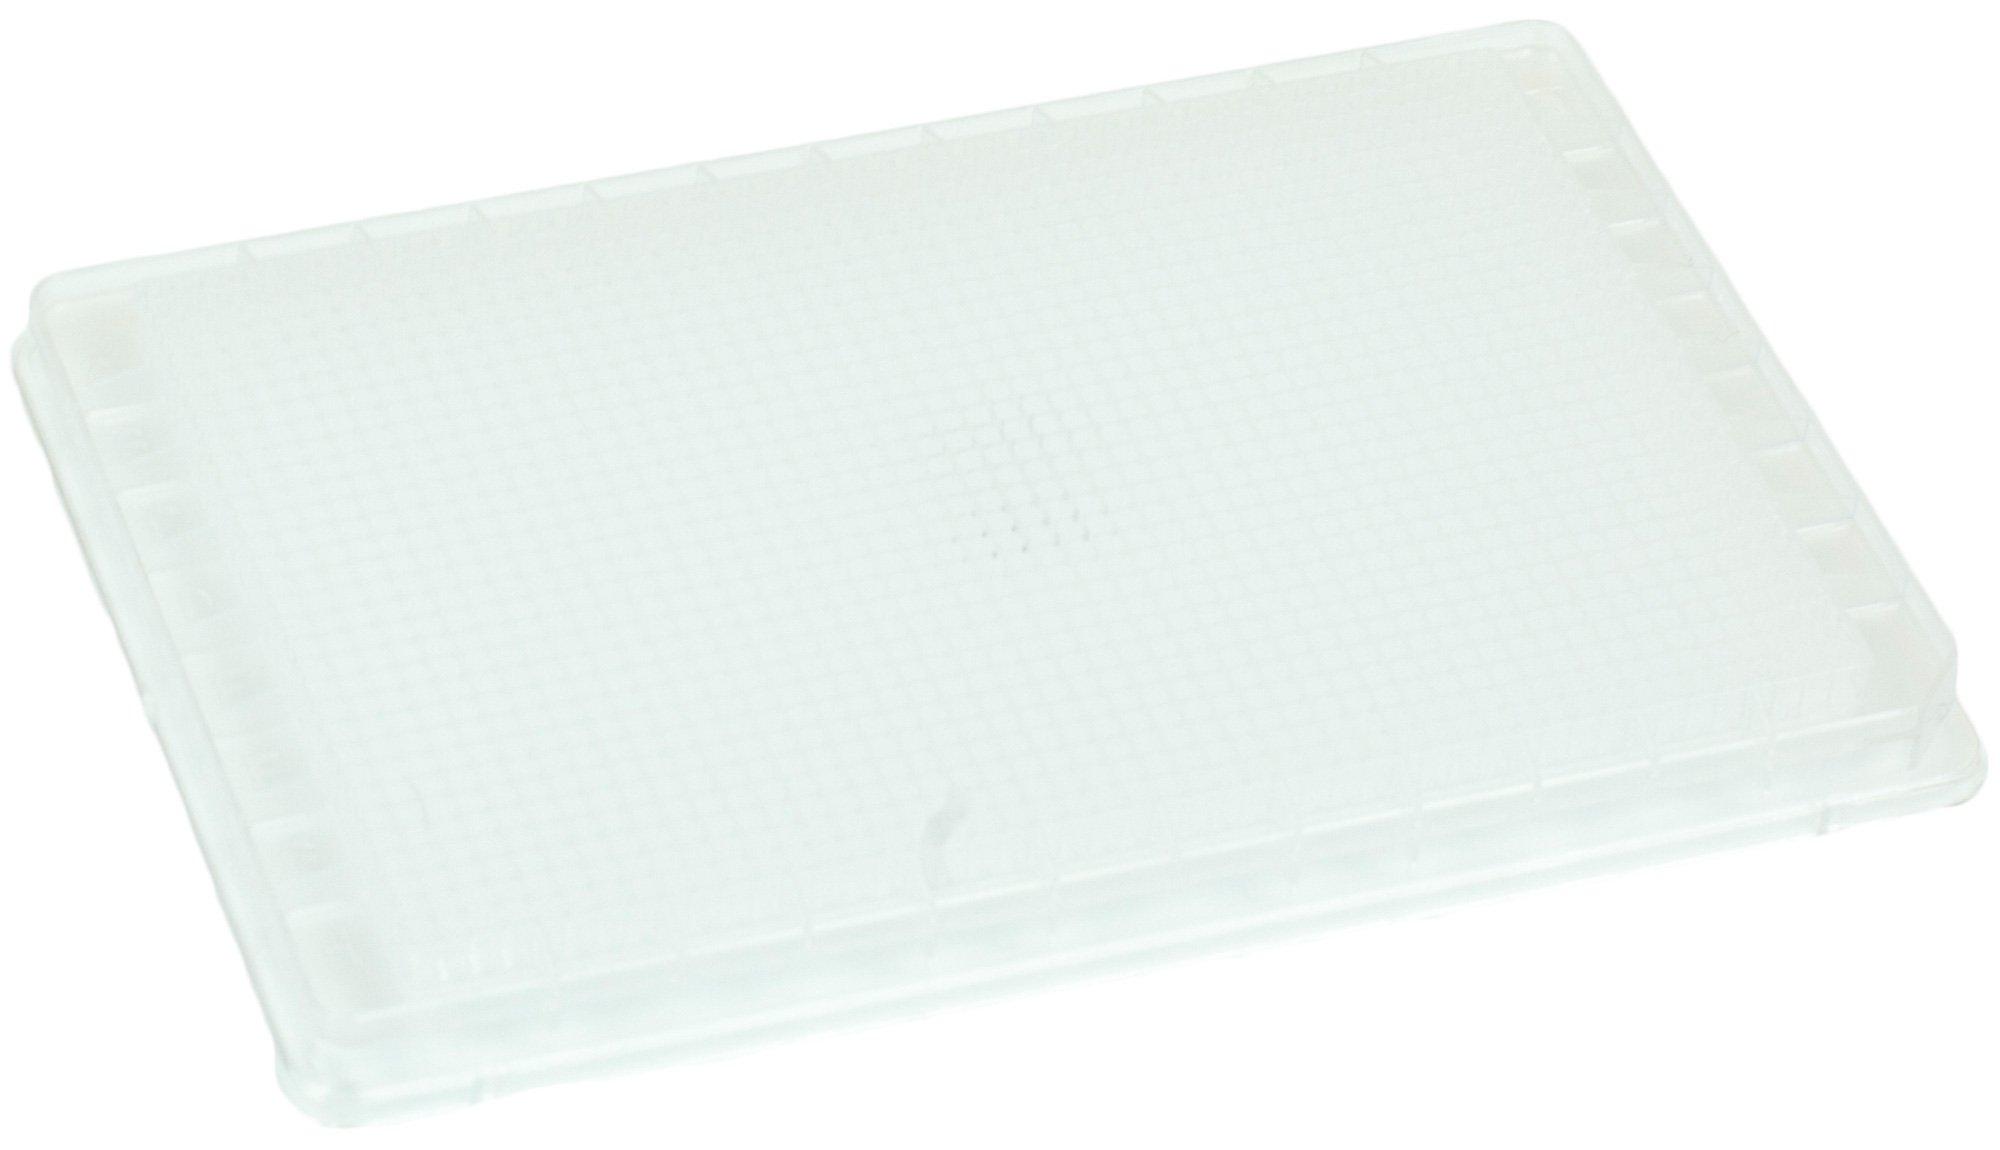 BRANDplates pureGrade Non-Treated Non-Sterile Surface 1536-Well Plate - Transparent, F-Bottom